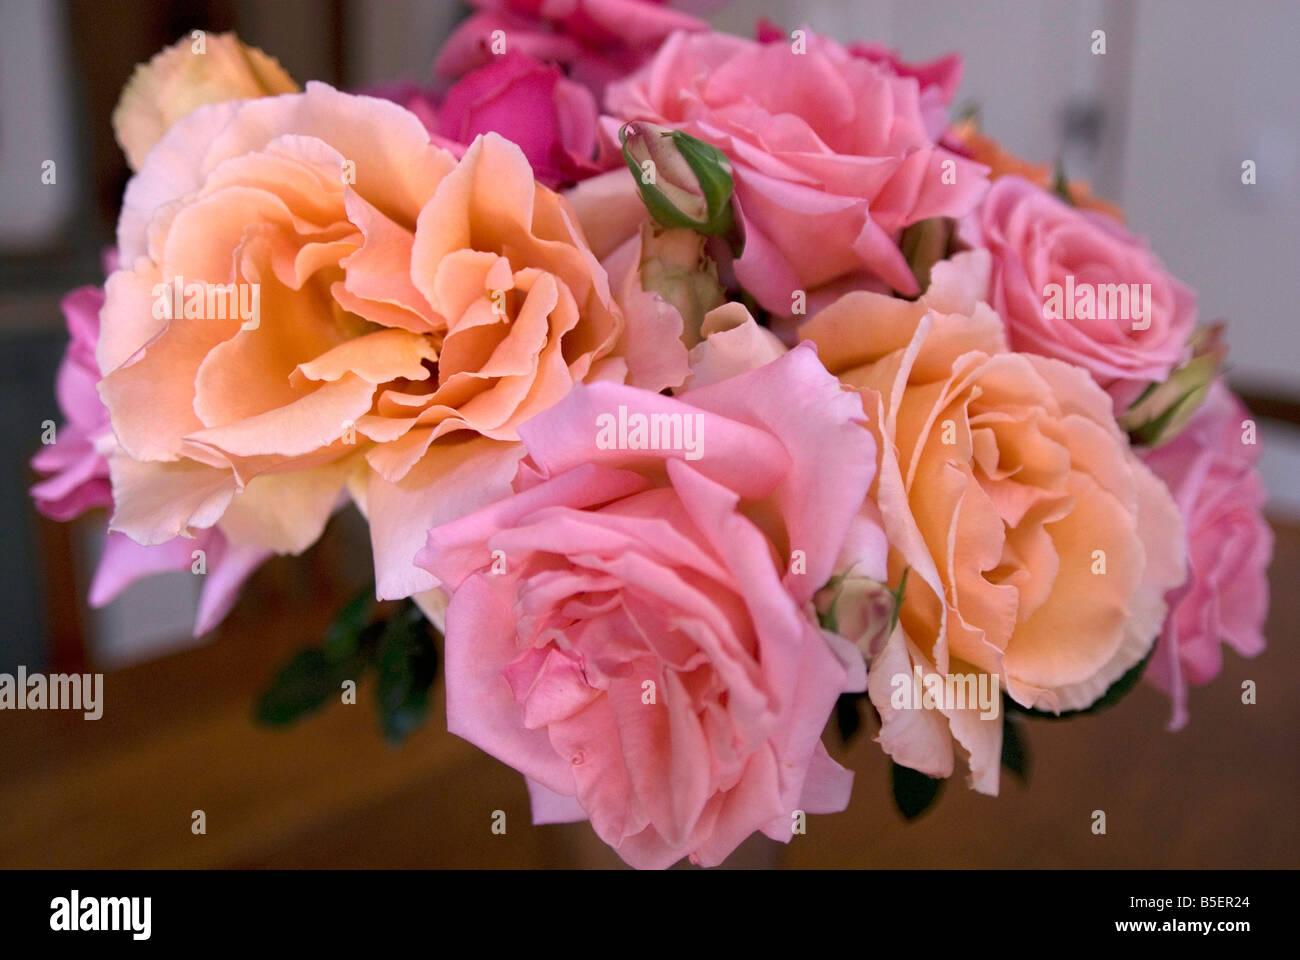 Red White Yellow Pink Orange Roses Stock Photos Red White Yellow